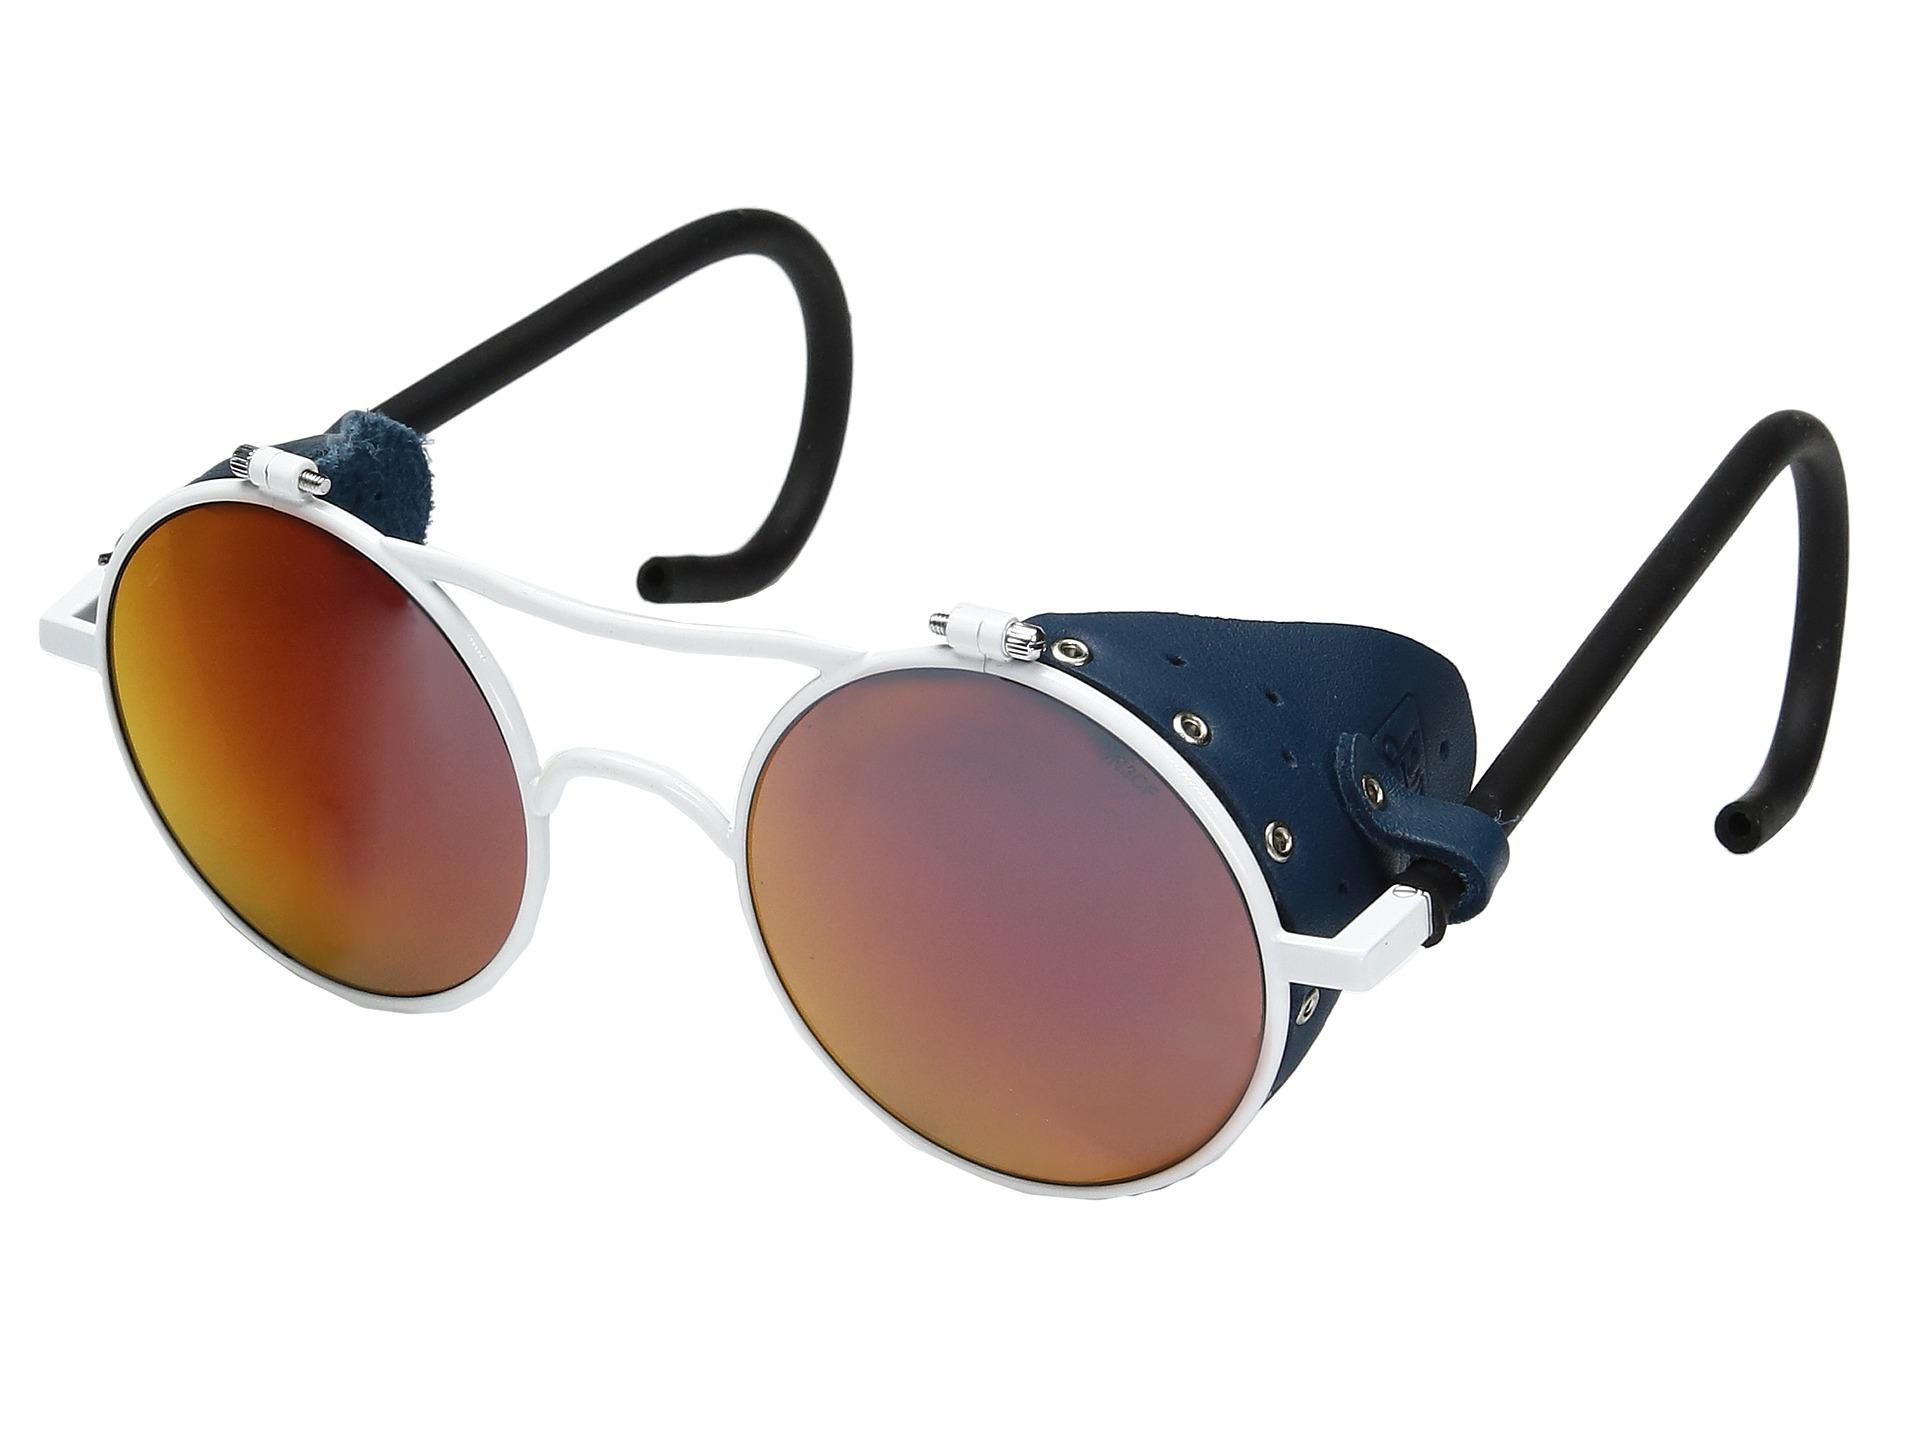 aa412efde6a Lyst - Julbo Eyewear Vermont Classic Sunglasses in Blue for Men